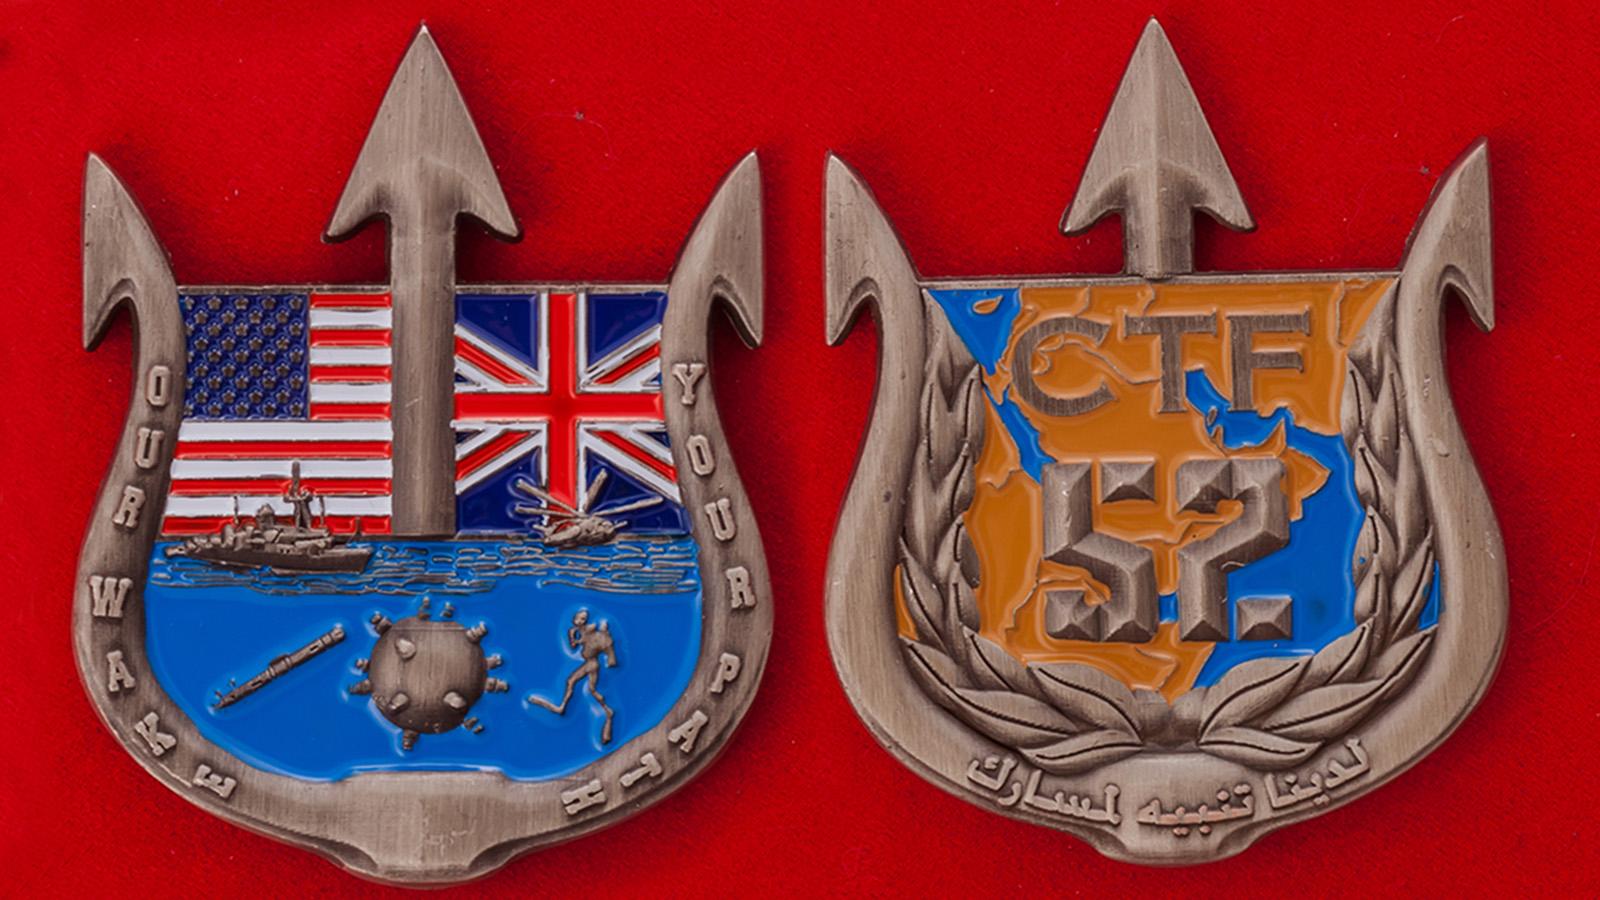 Челлендж коин командира 52-го оперативного соединения водолазов ВМС США - аверс и реверс